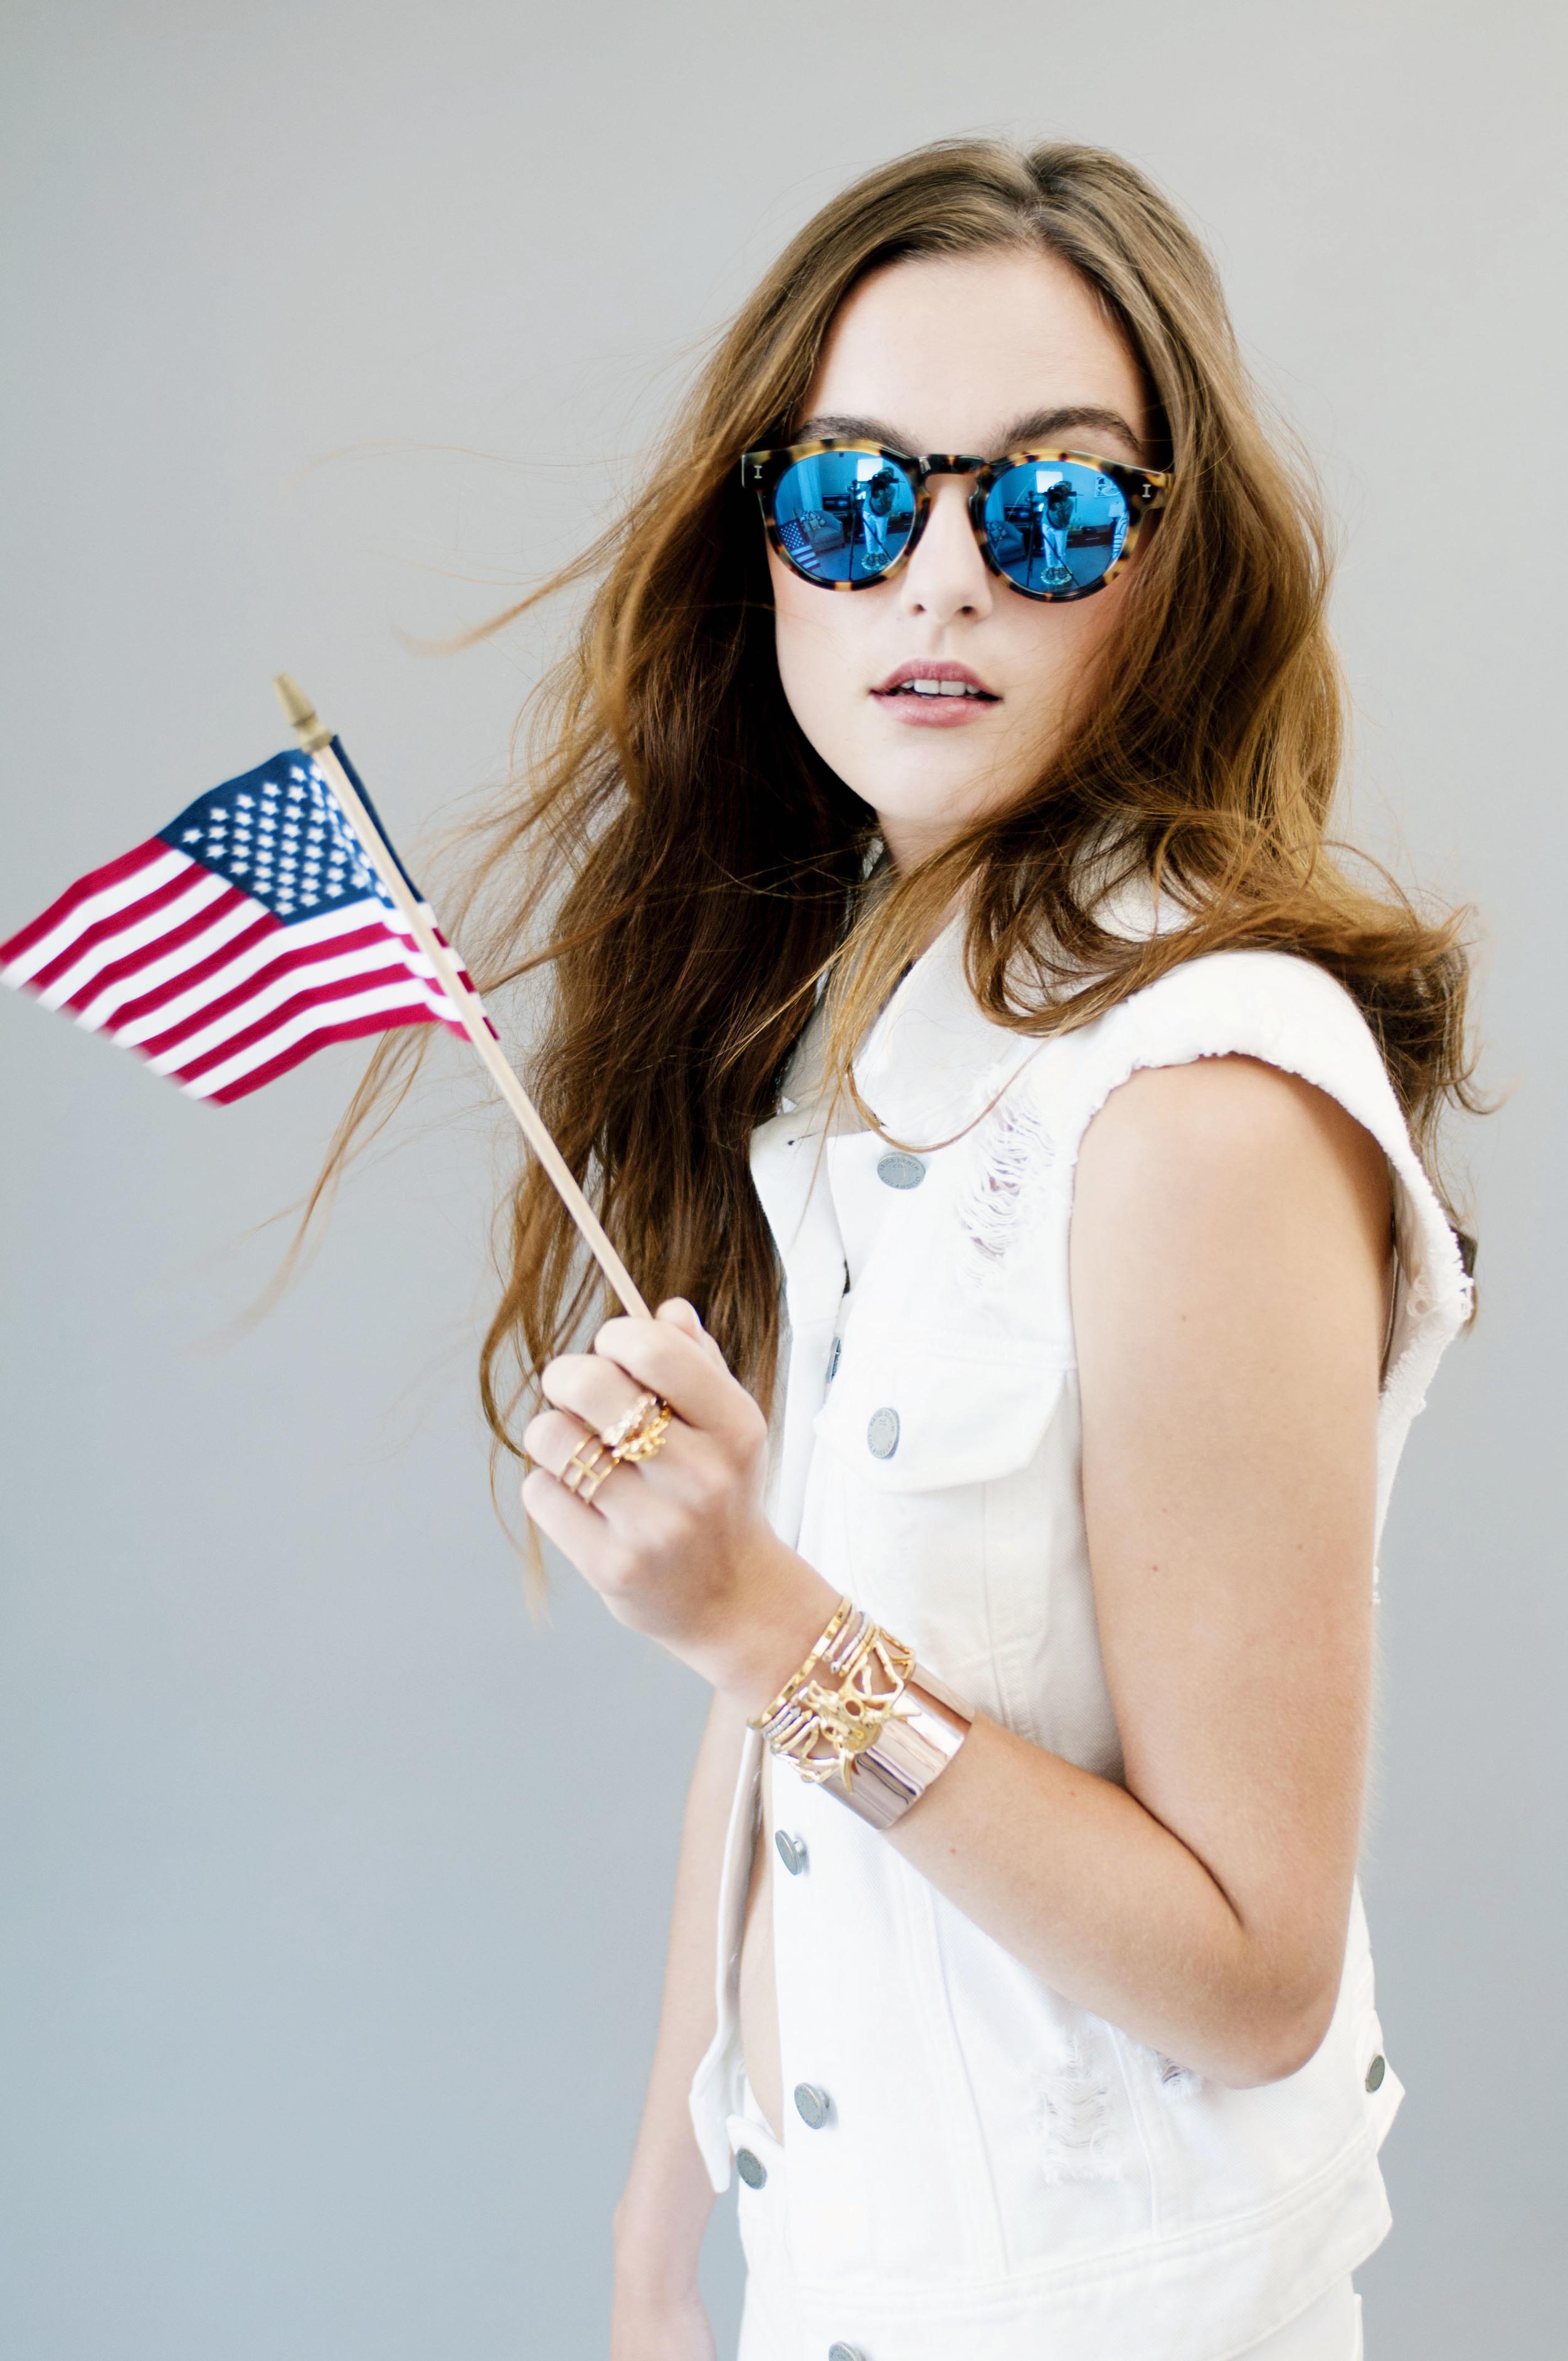 photo: Angie Silvy    H/MKU: Rebecca Taft    model: morgan @ Stars Model Management